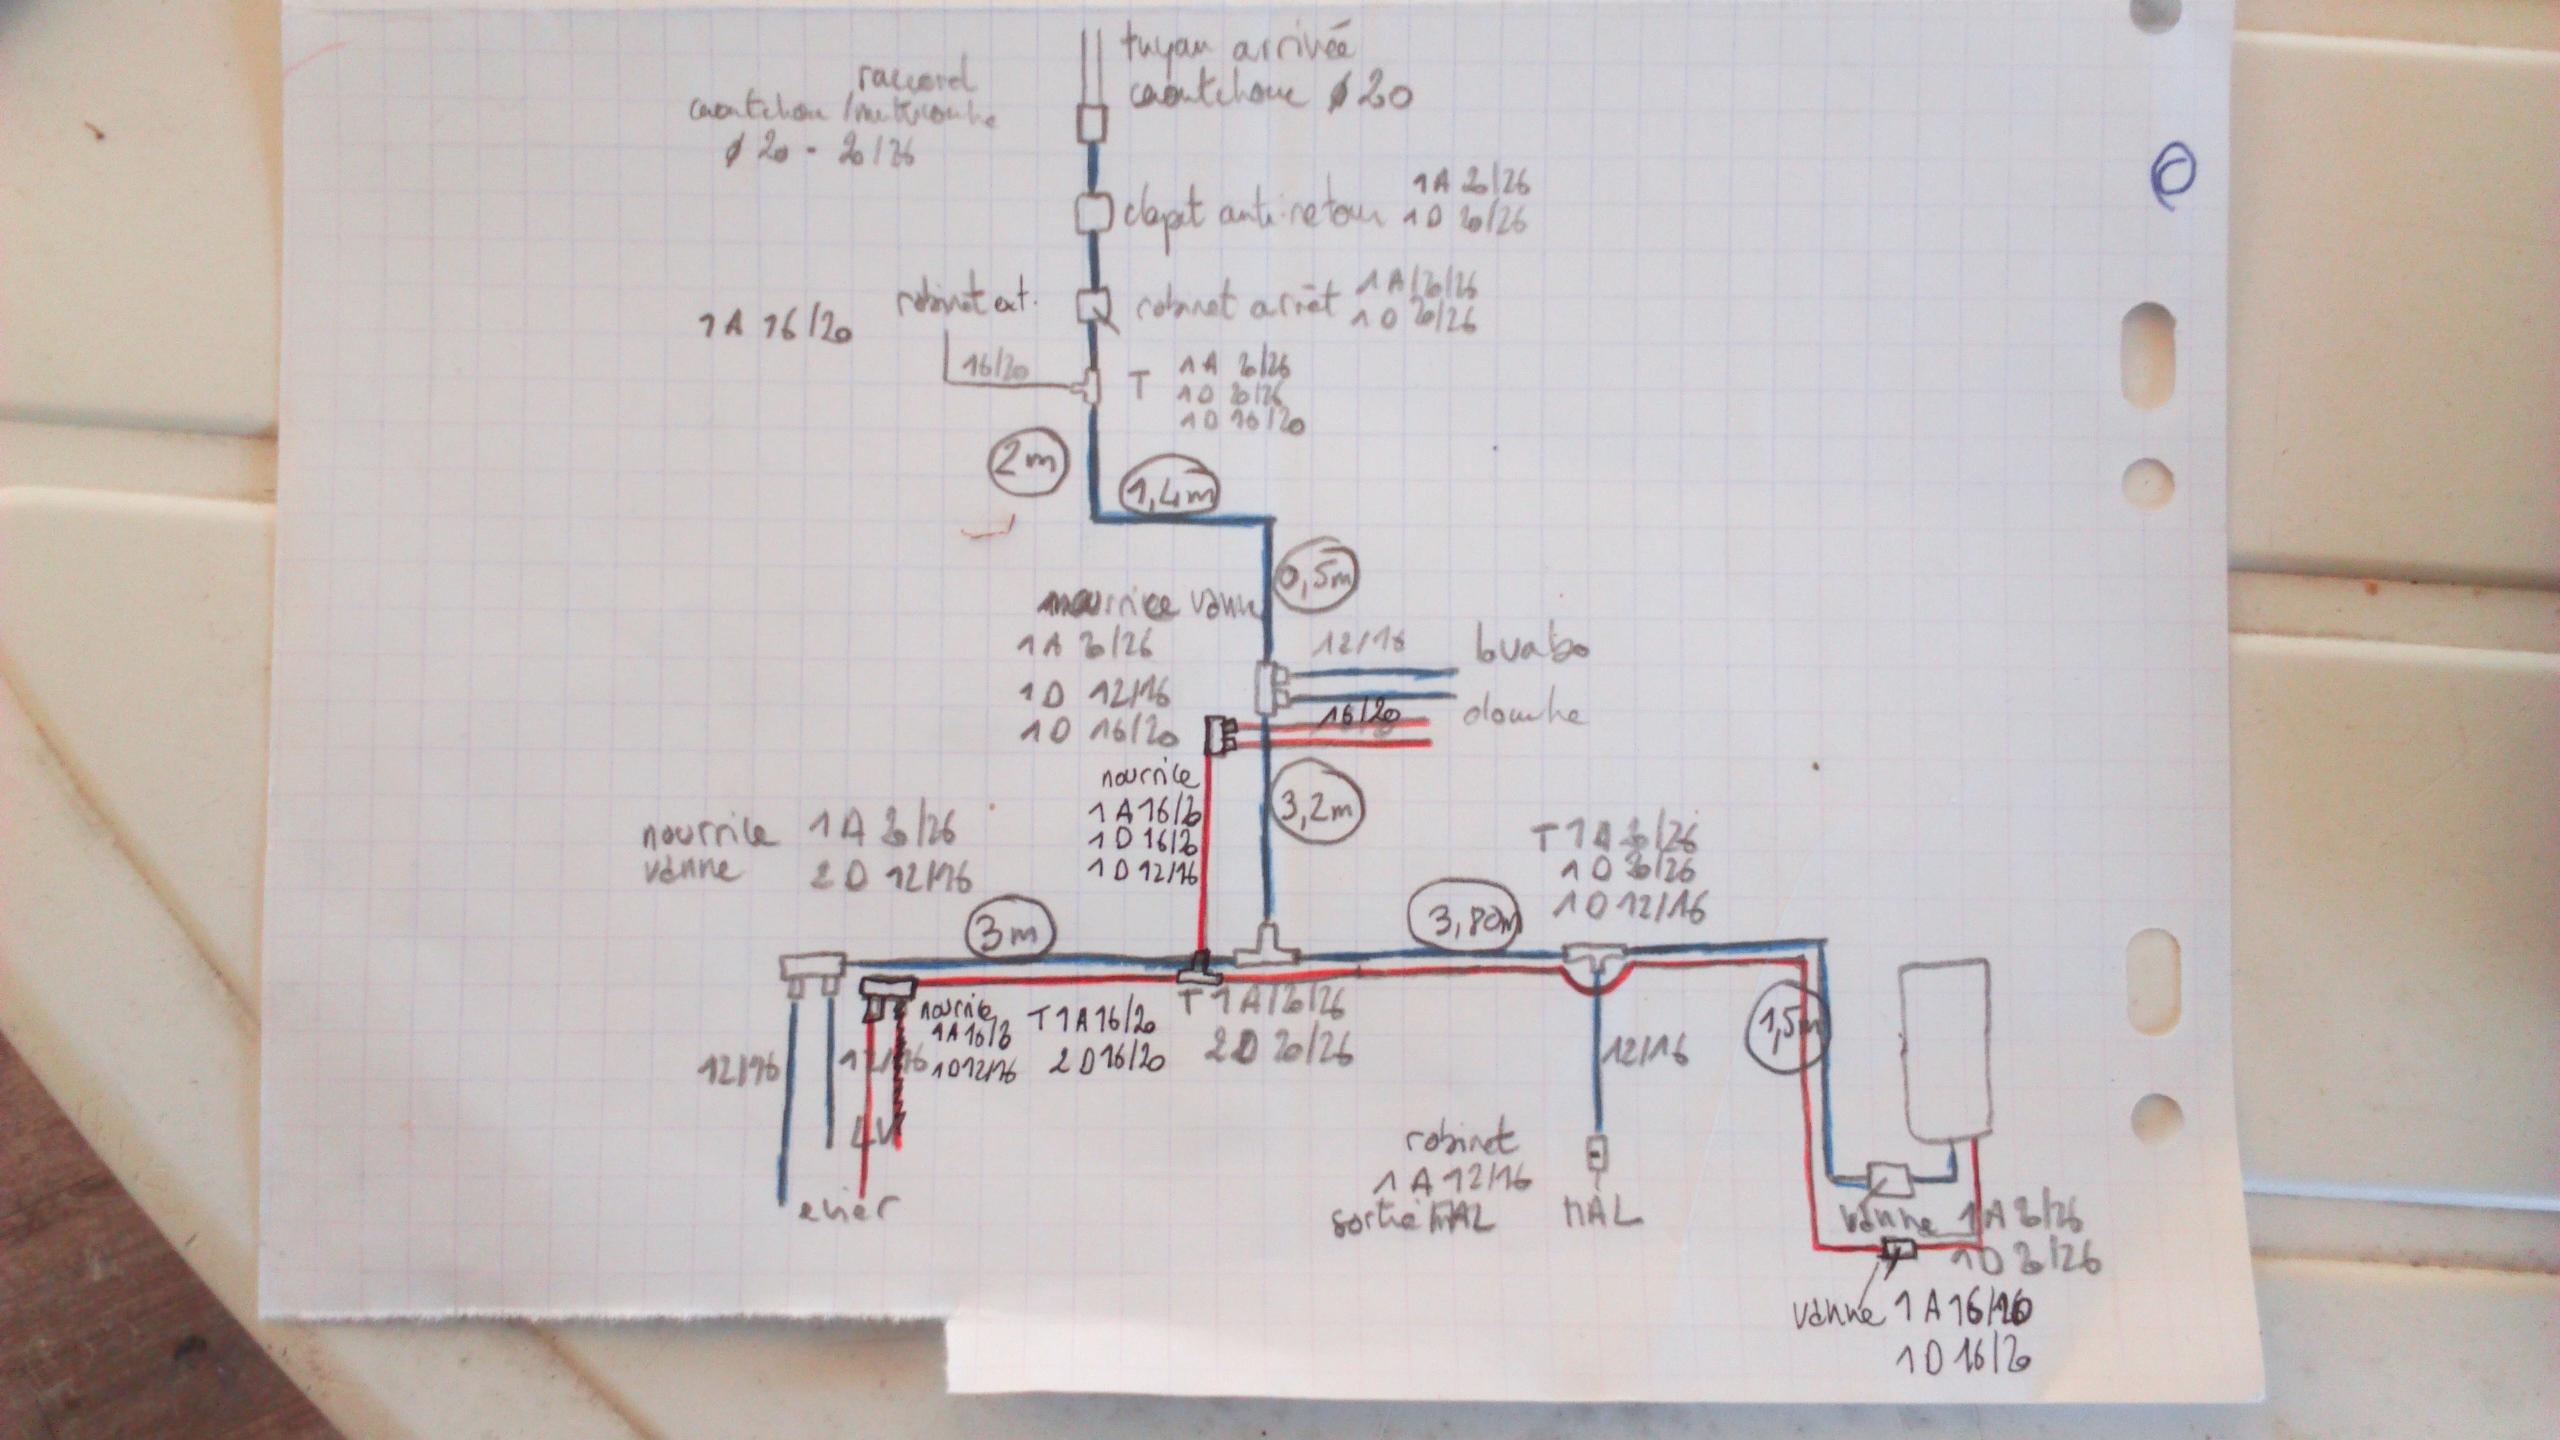 schéma plomberie.JPG, 1.22 mb, 2560 x 1440